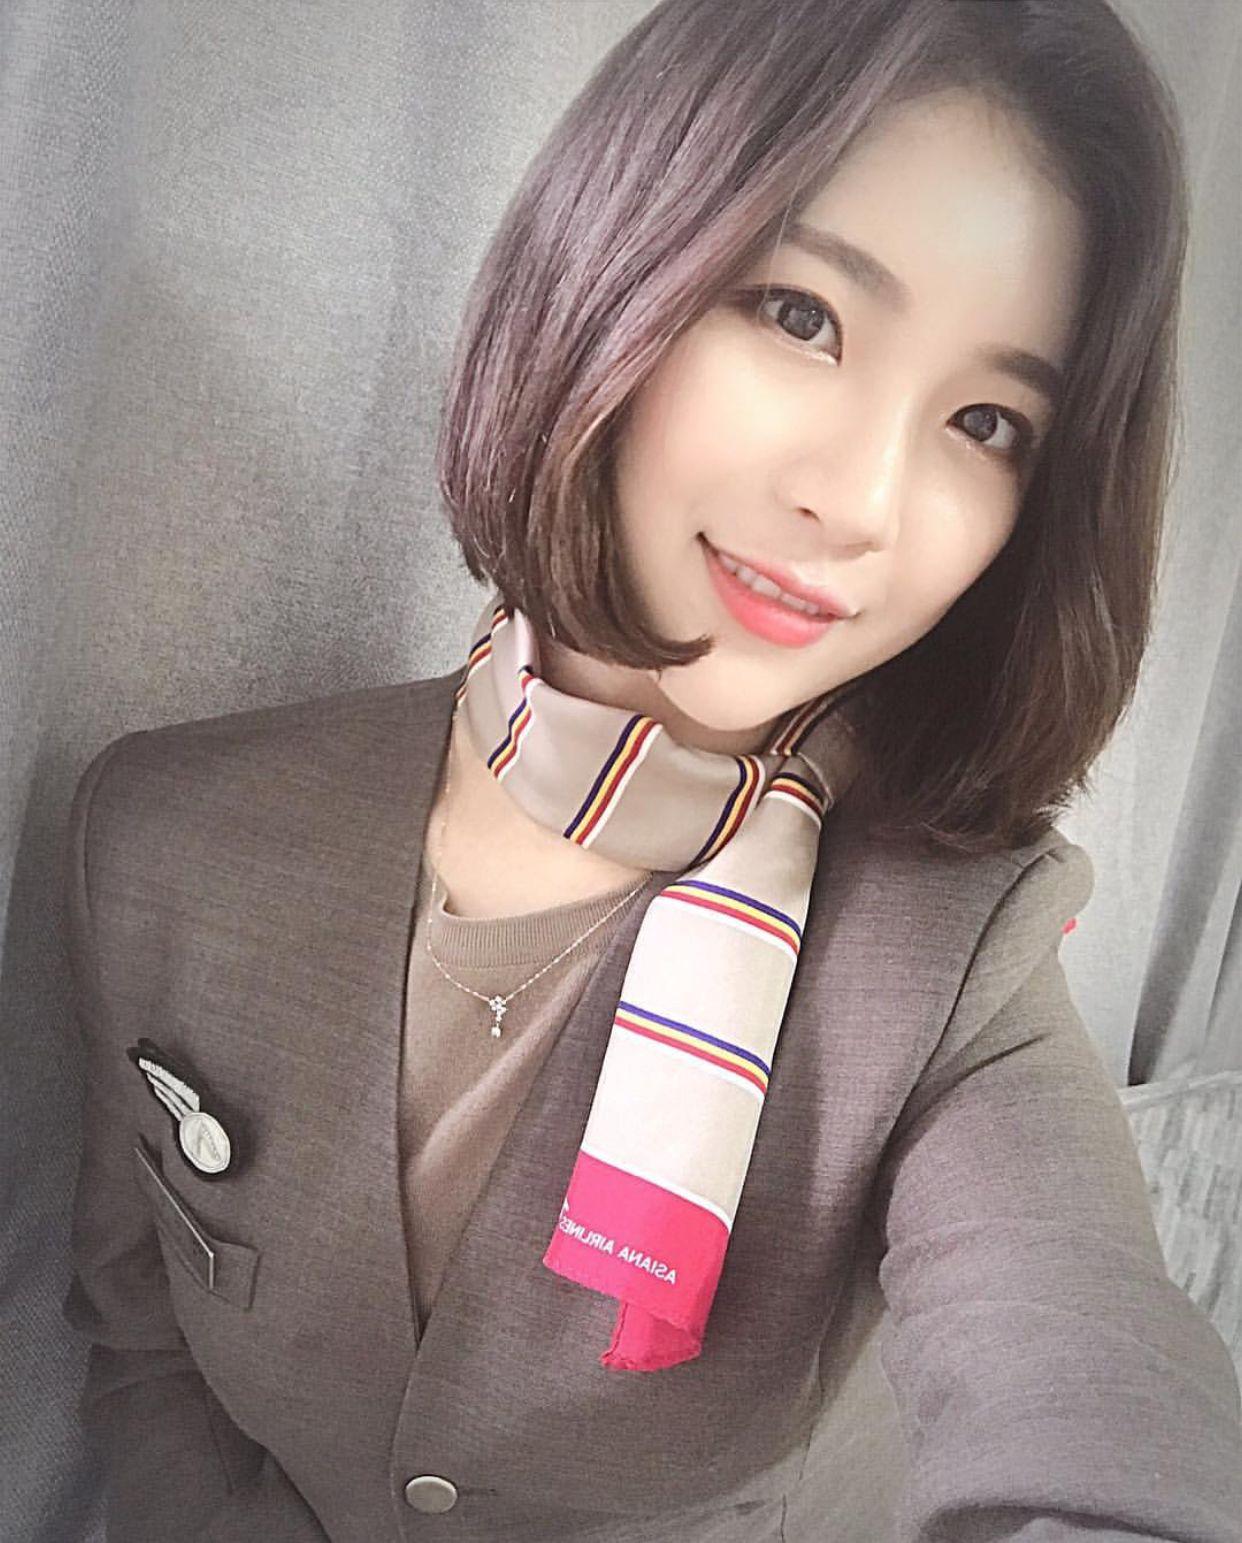 Cute asian girl nude nice body